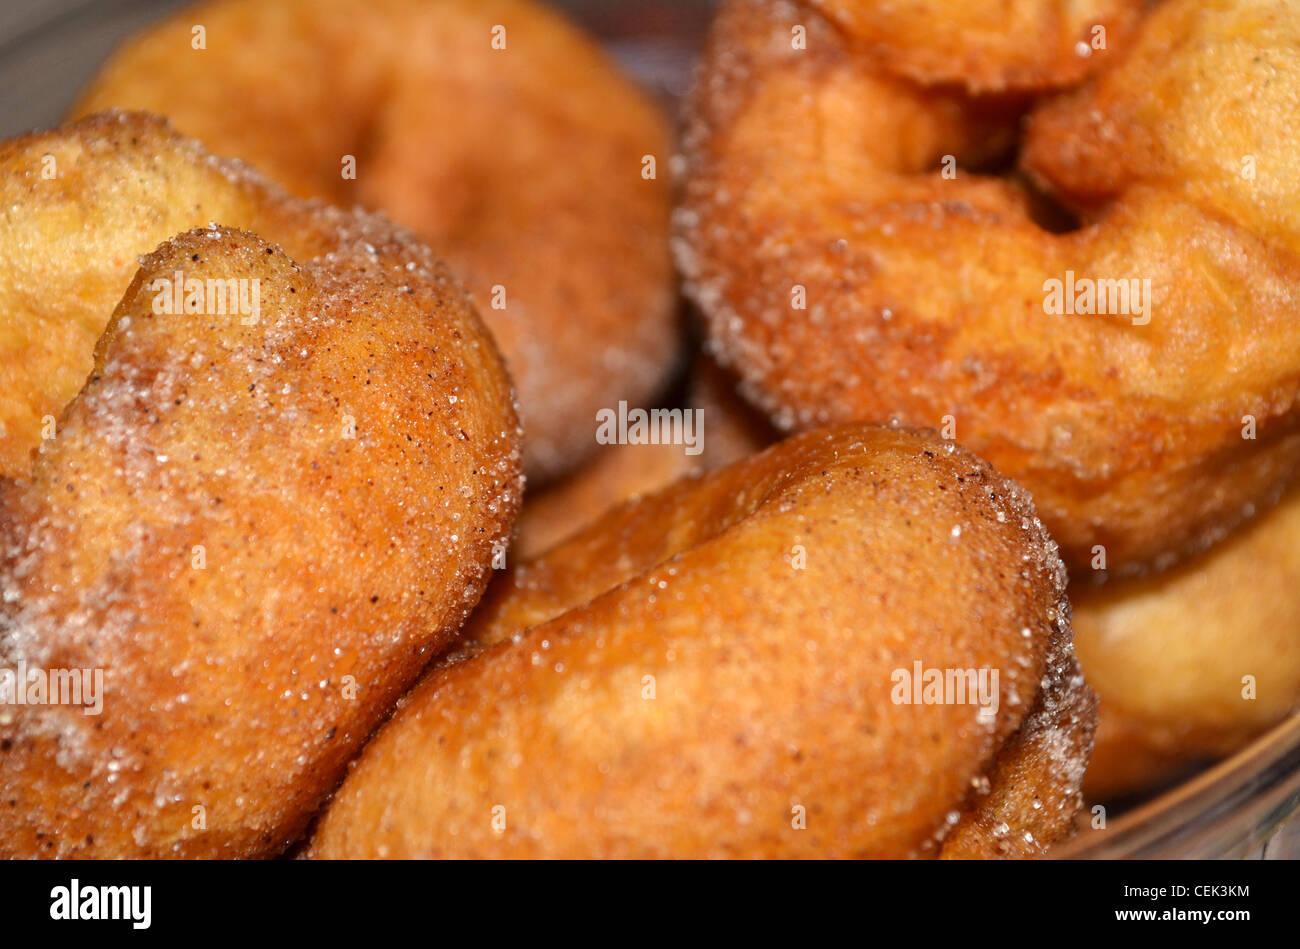 frische mini zimt donuts stockfoto bild 43445912 alamy. Black Bedroom Furniture Sets. Home Design Ideas